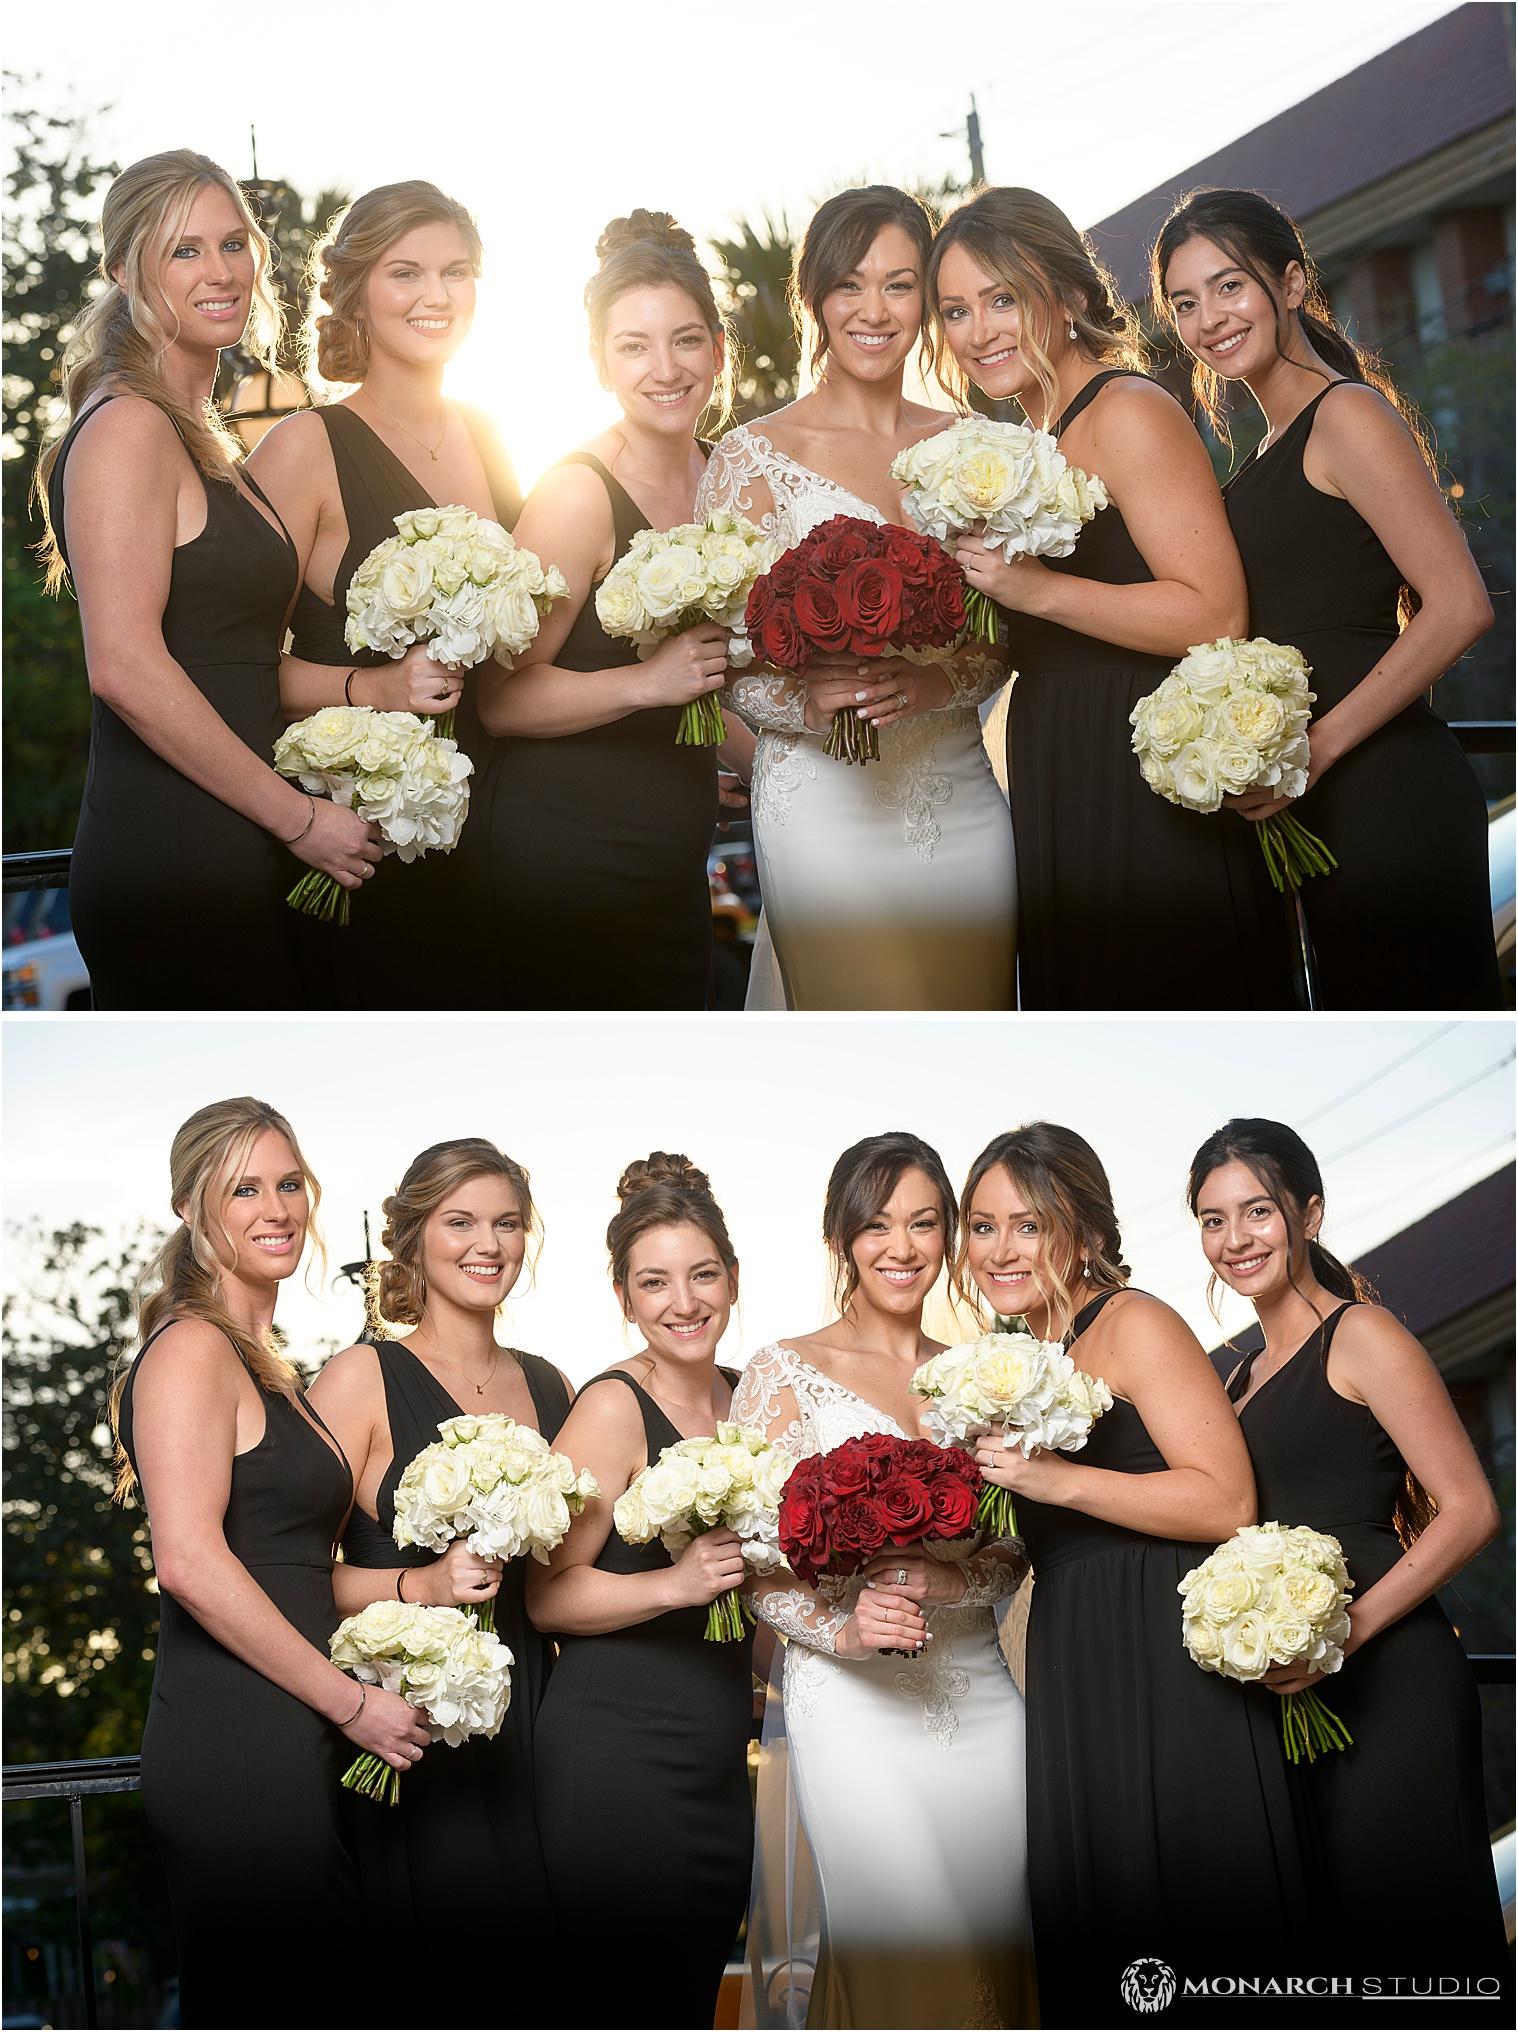 st-augustine-high-end-wedding-photographers-084.jpg